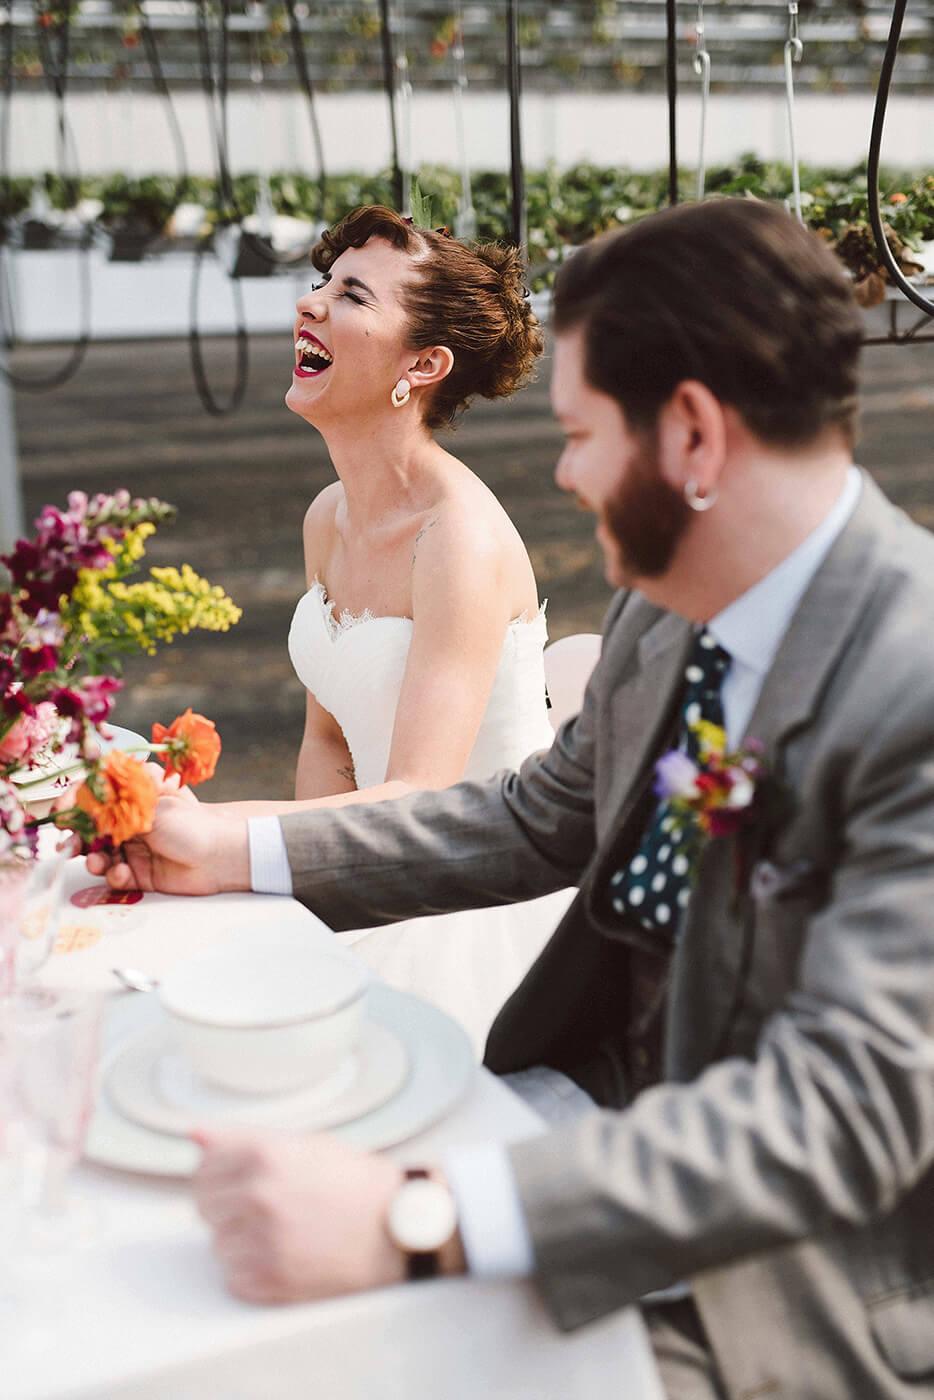 roma-organizacao-eventos-editorial-mid-century-modern-wedding-in-a-strawberry-field-19